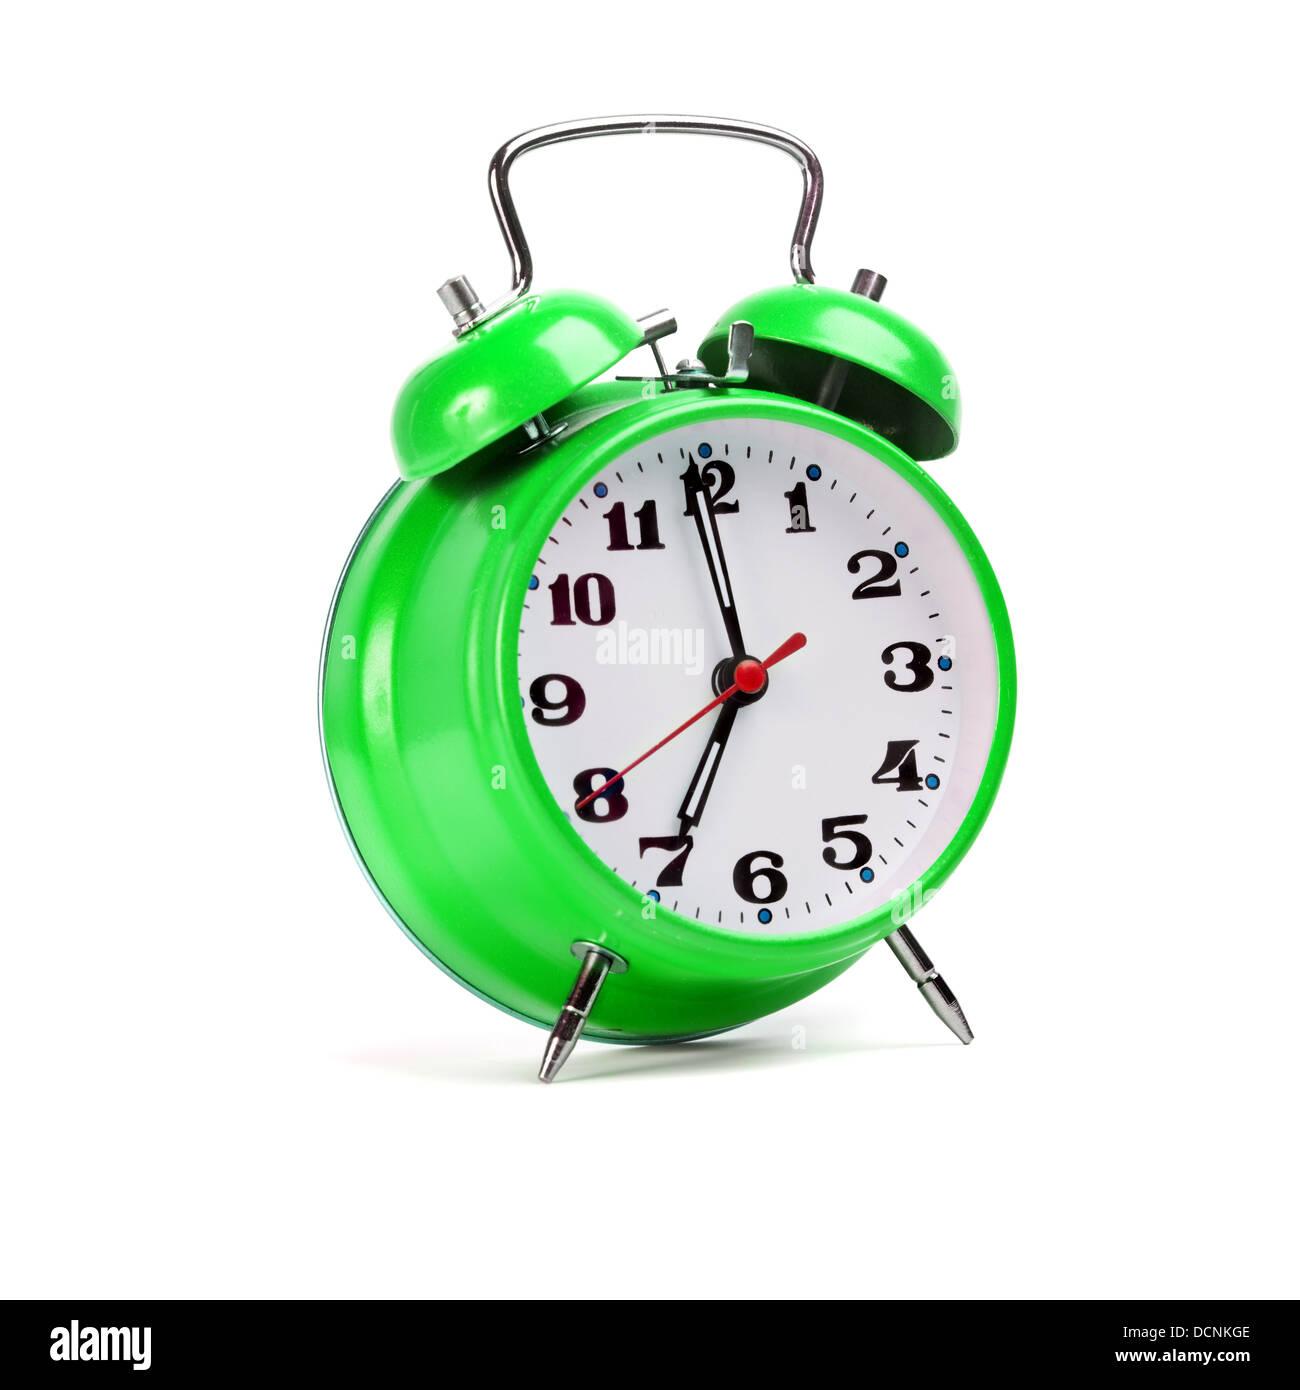 Reloj despertador clásico aislado sobre blanco Imagen De Stock